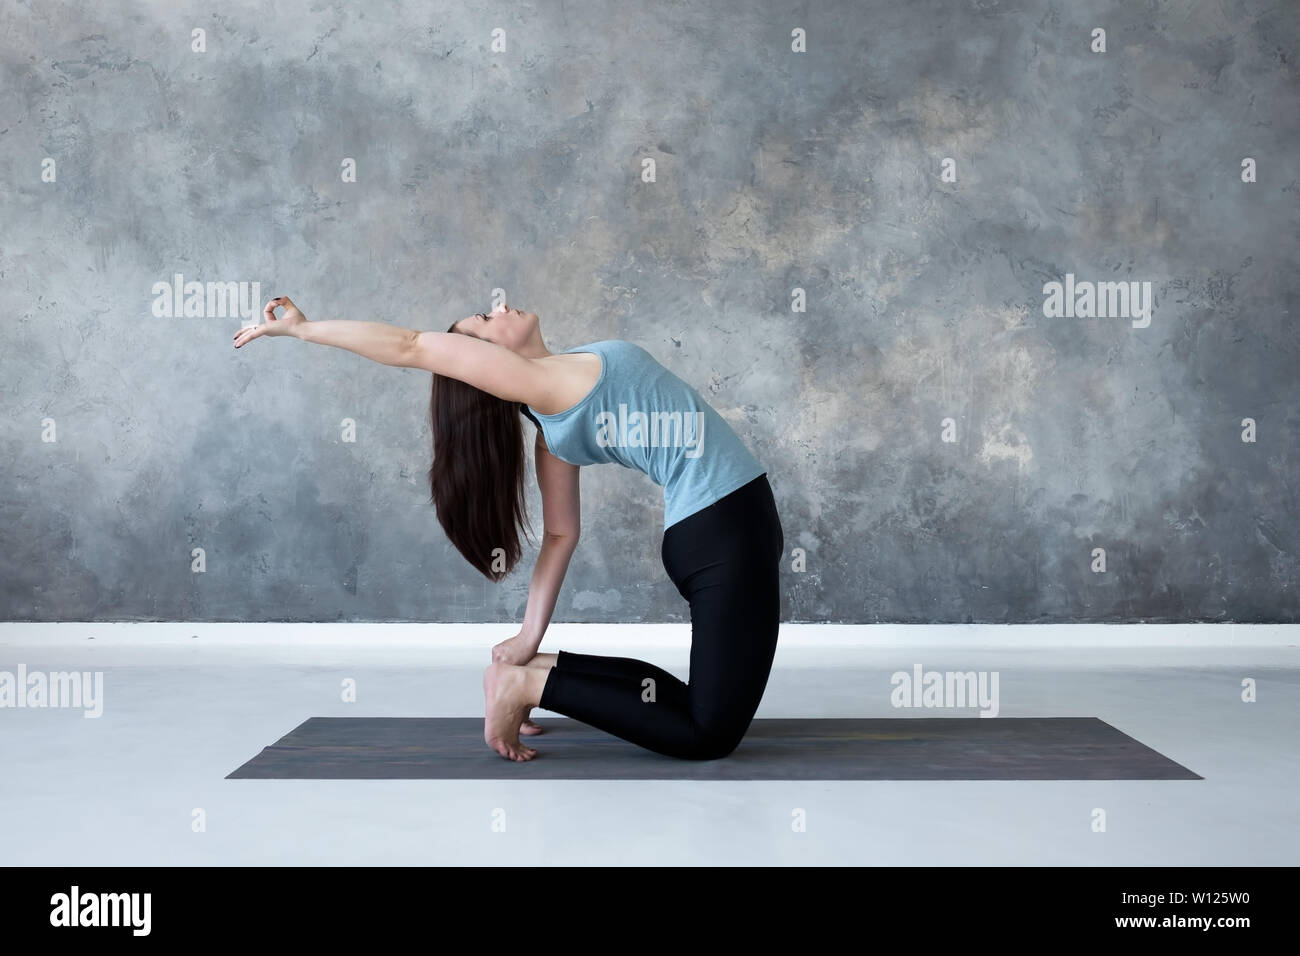 Woman practicing yoga, doing Ushtrasana, Camel Pose, at studio full length. - Stock Image